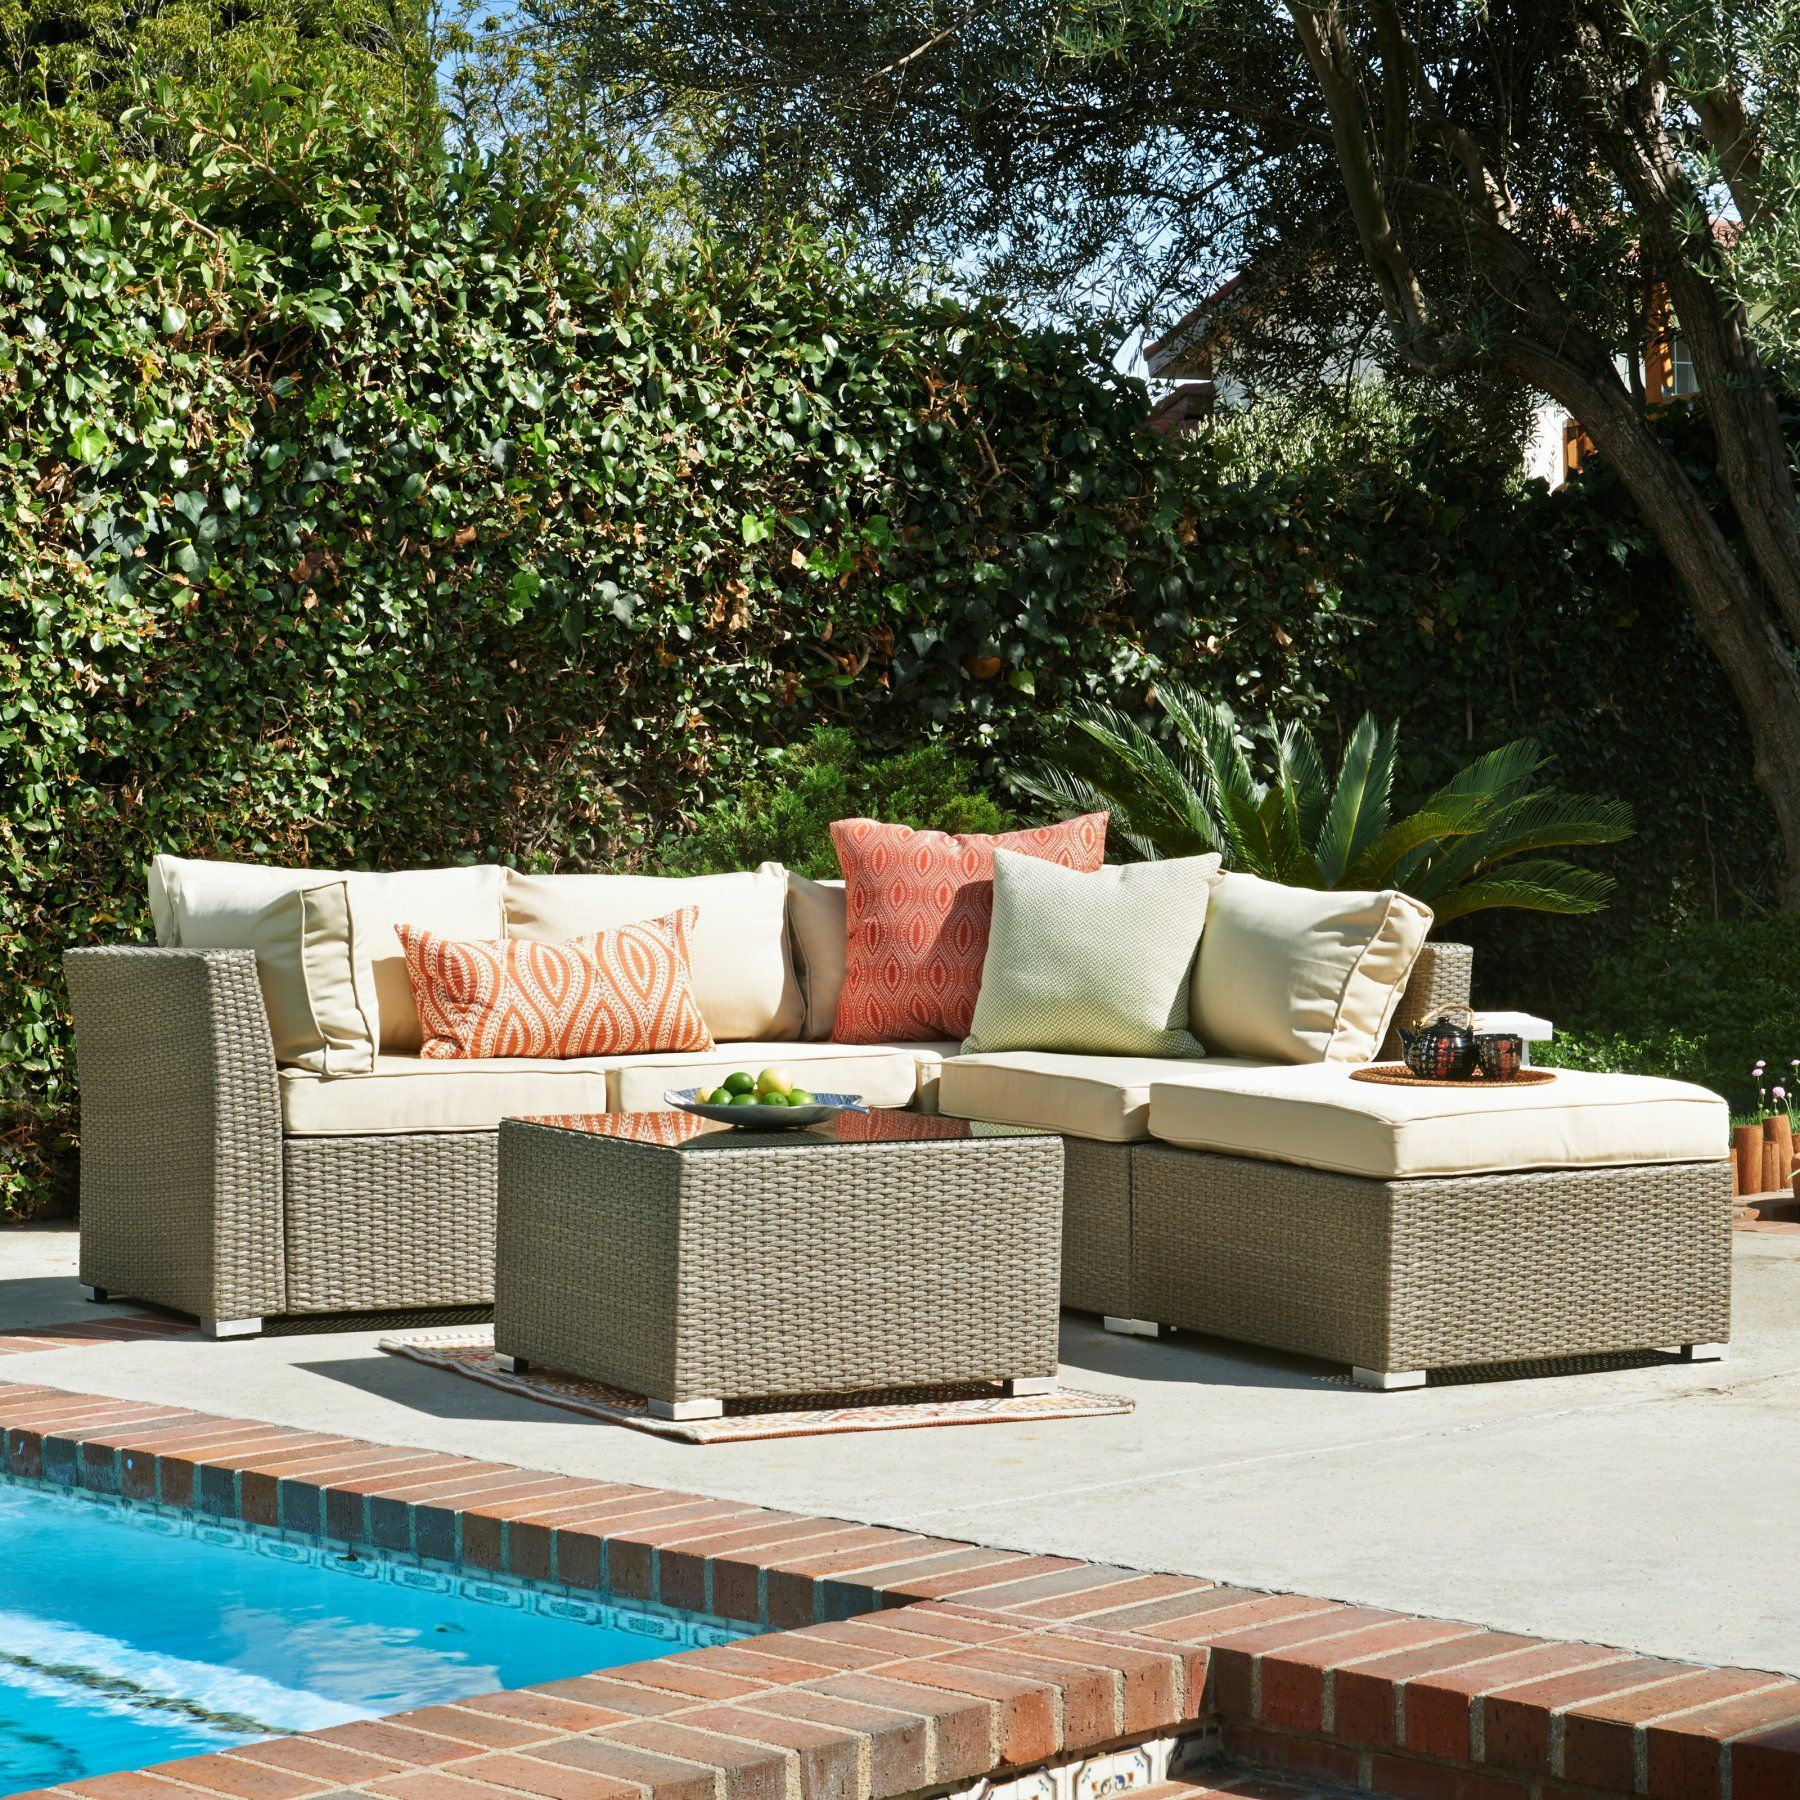 Coral Coast Jicaro 5 Piece Outdoor Wicker Sectional Sofa Set